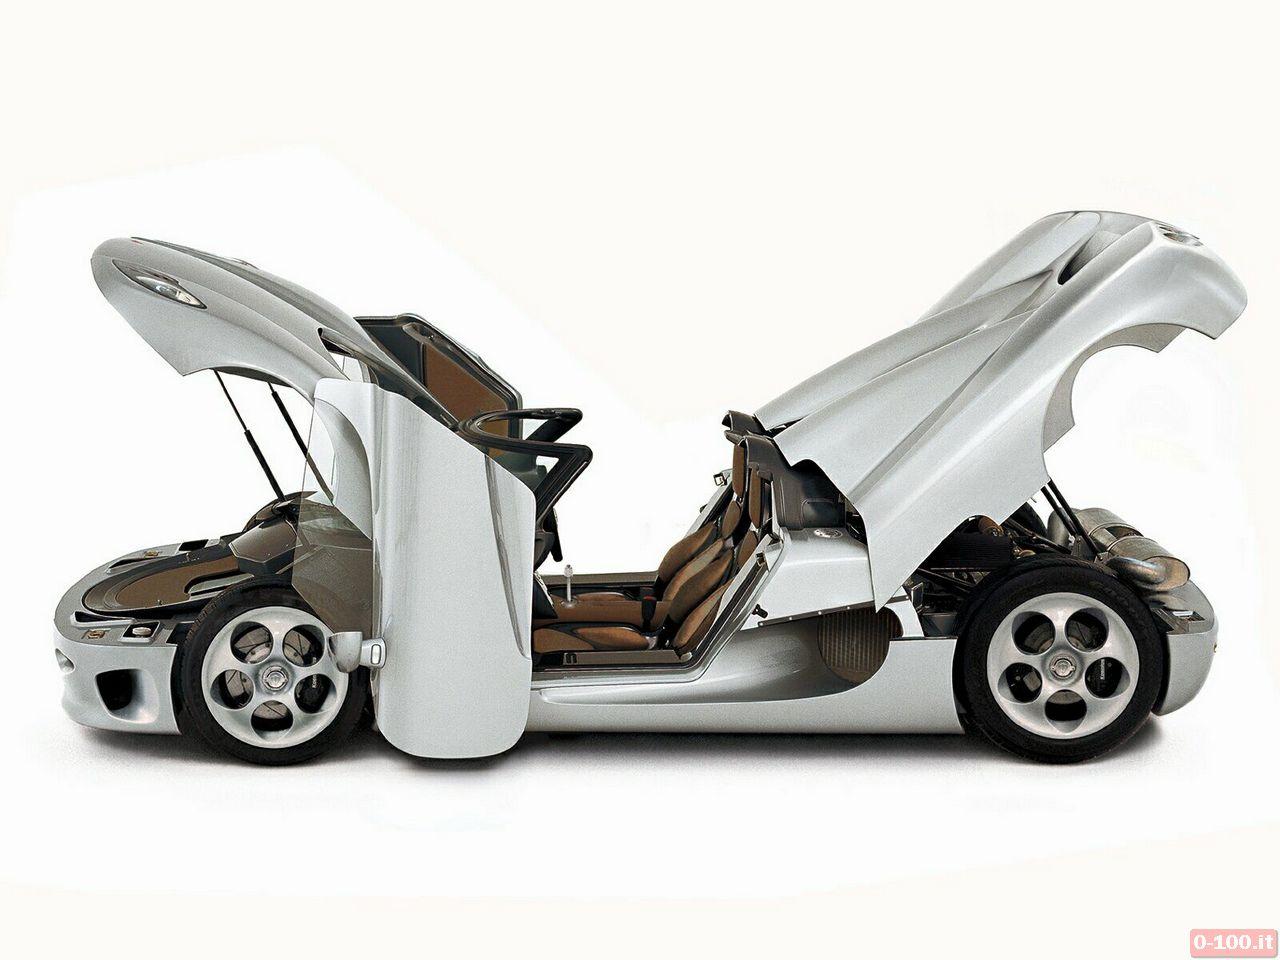 Koenigsegg CC - 0-100.it